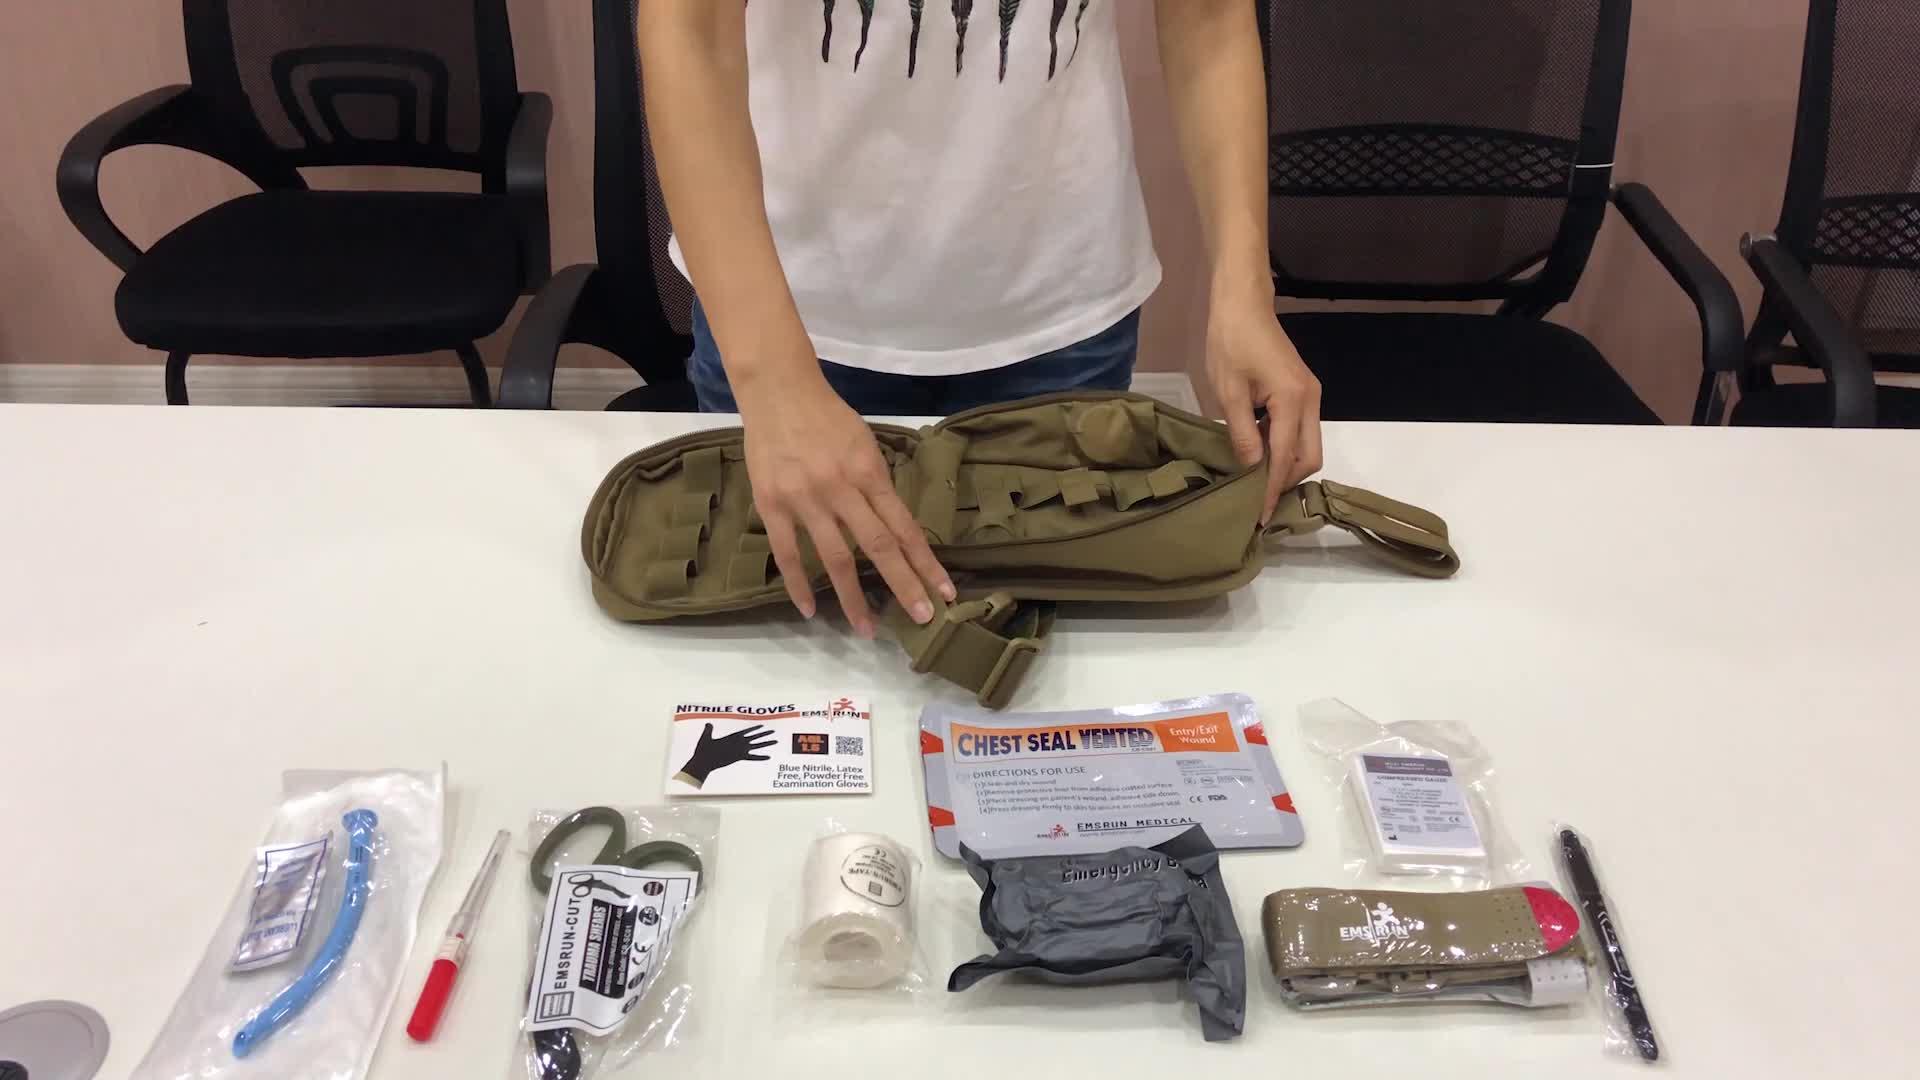 Kit de botiquín de primeros auxilios táctico militar, bolsa para traumatismos al aire libre multiusos, nuevo producto a bordo